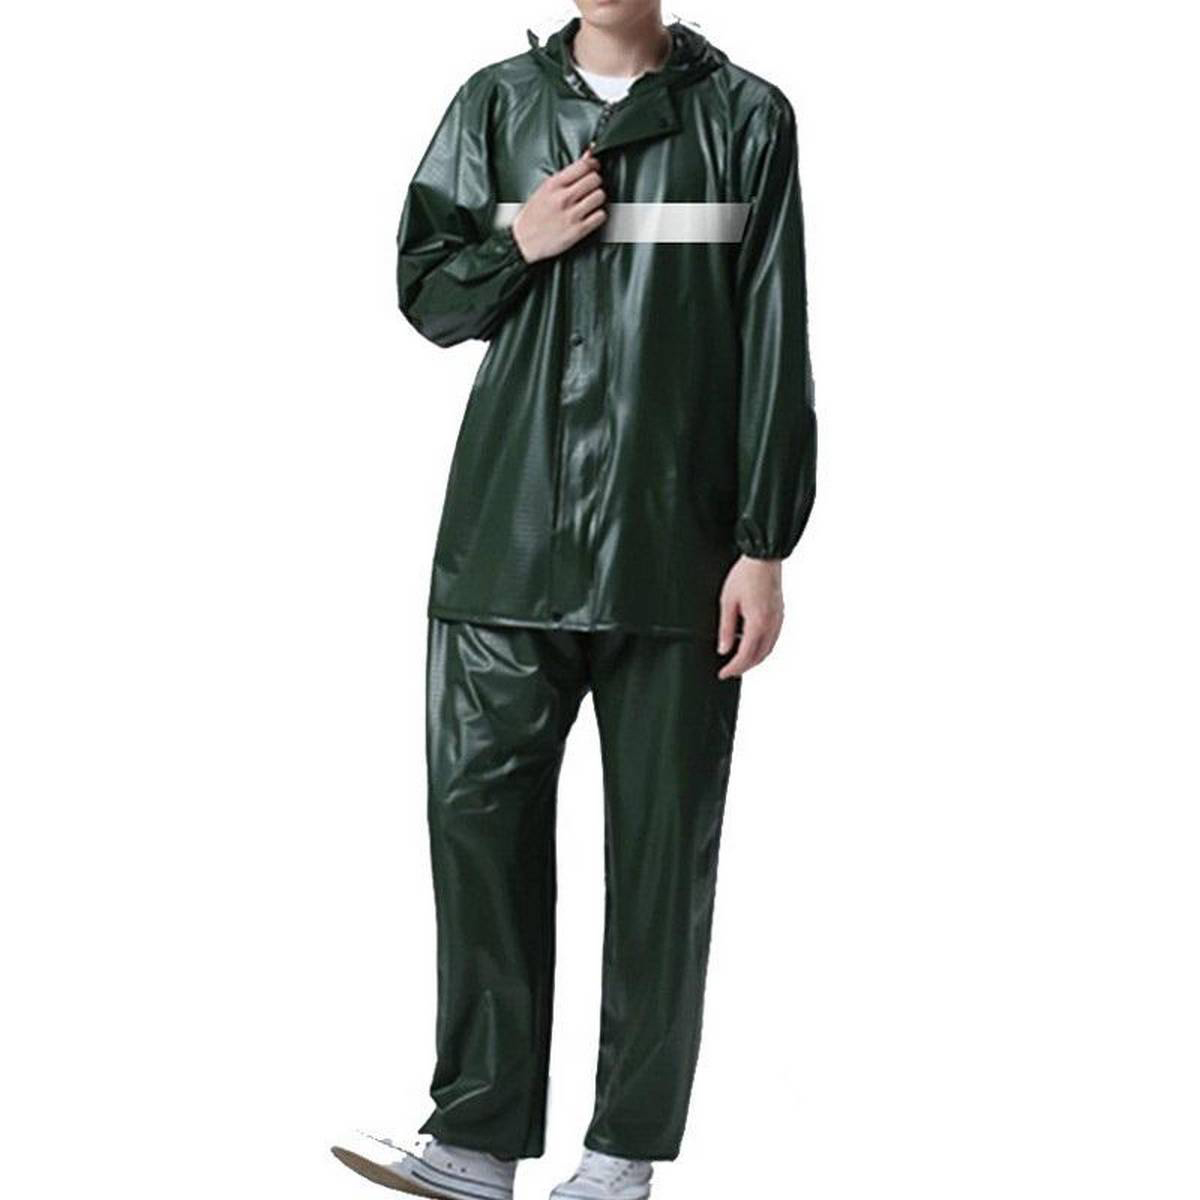 PREMIUM QUALITY / High Elasticity PVC Raincoat Pants Suit Waterproof Men Raincoat Impermeable Bicycle Motorcycle Electrombile Women Hooded Rainwear barsati